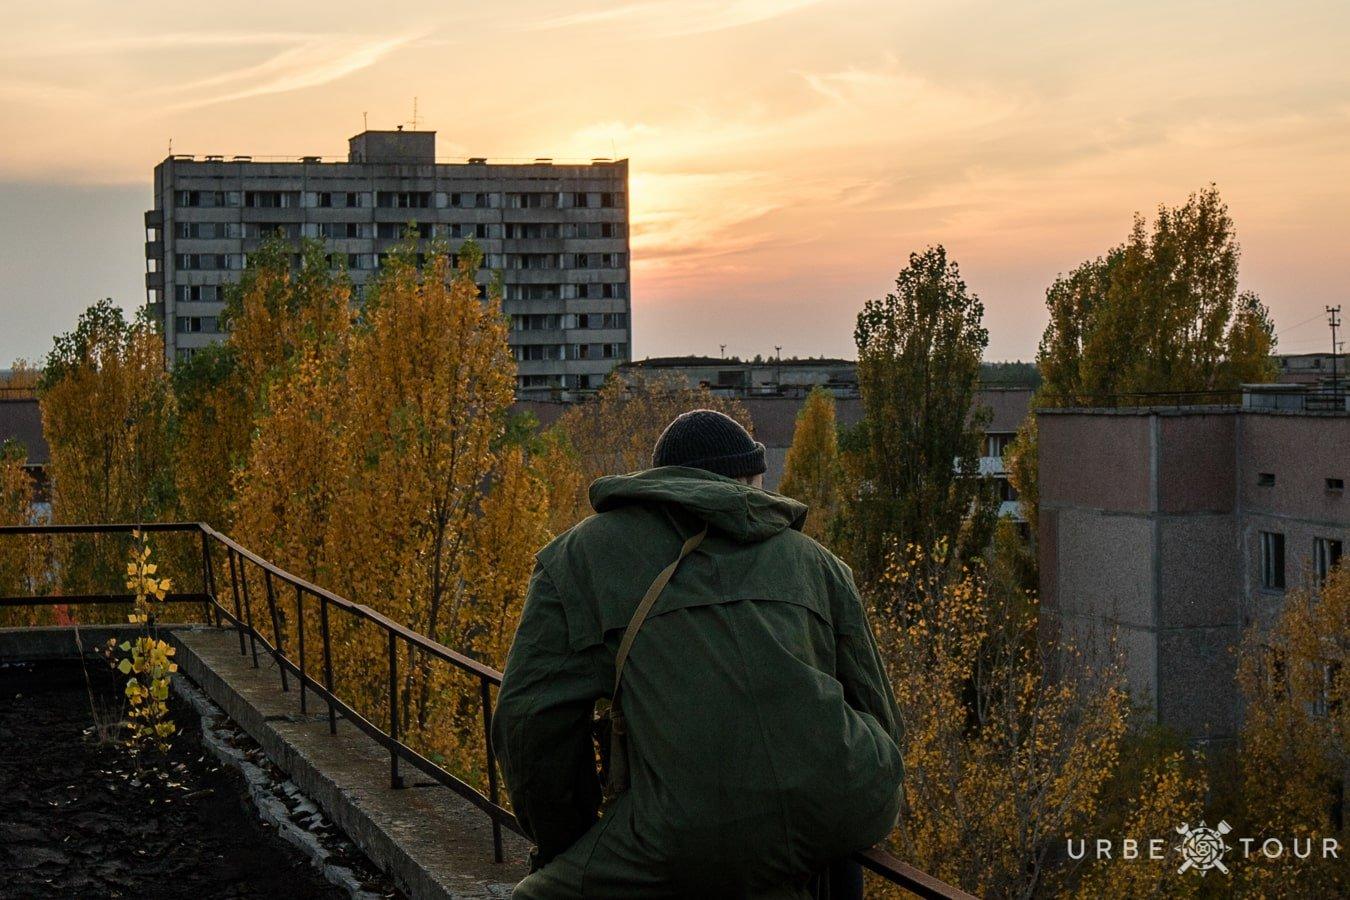 stalker is watching from the rooftop in Kiev